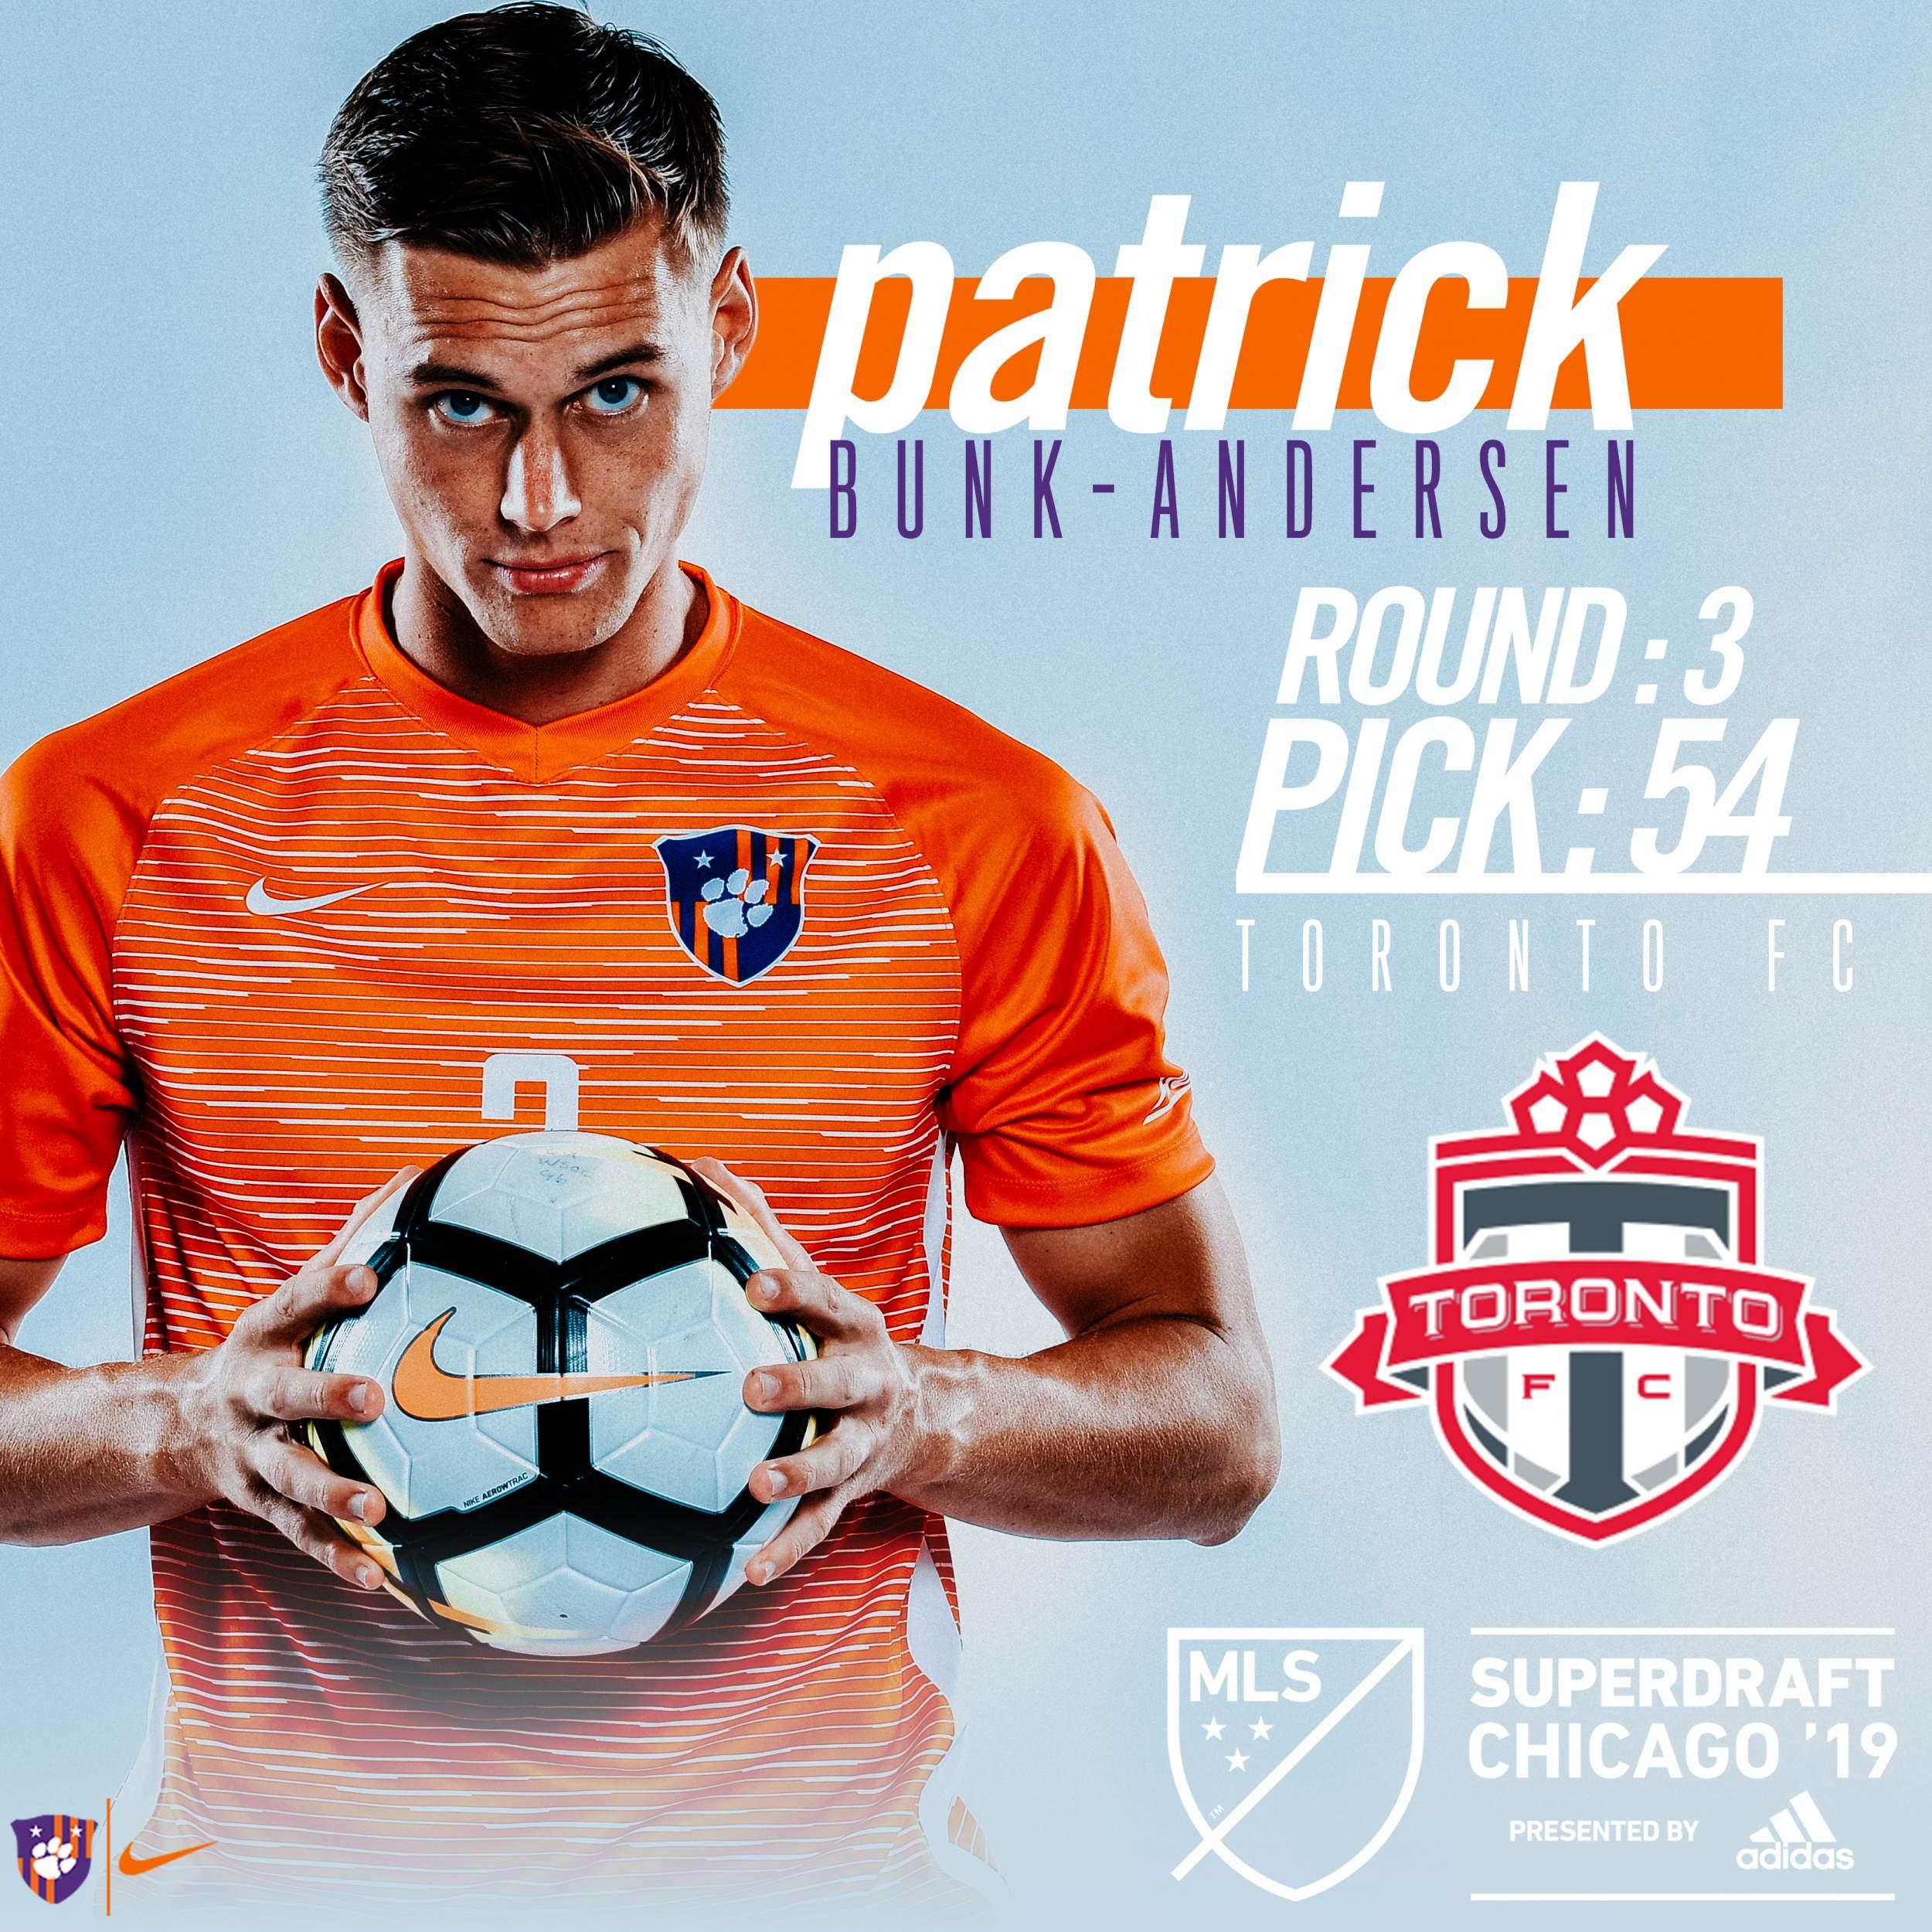 Bunk-Andersen Selected in Third Round of 2019 MLS SuperDraft